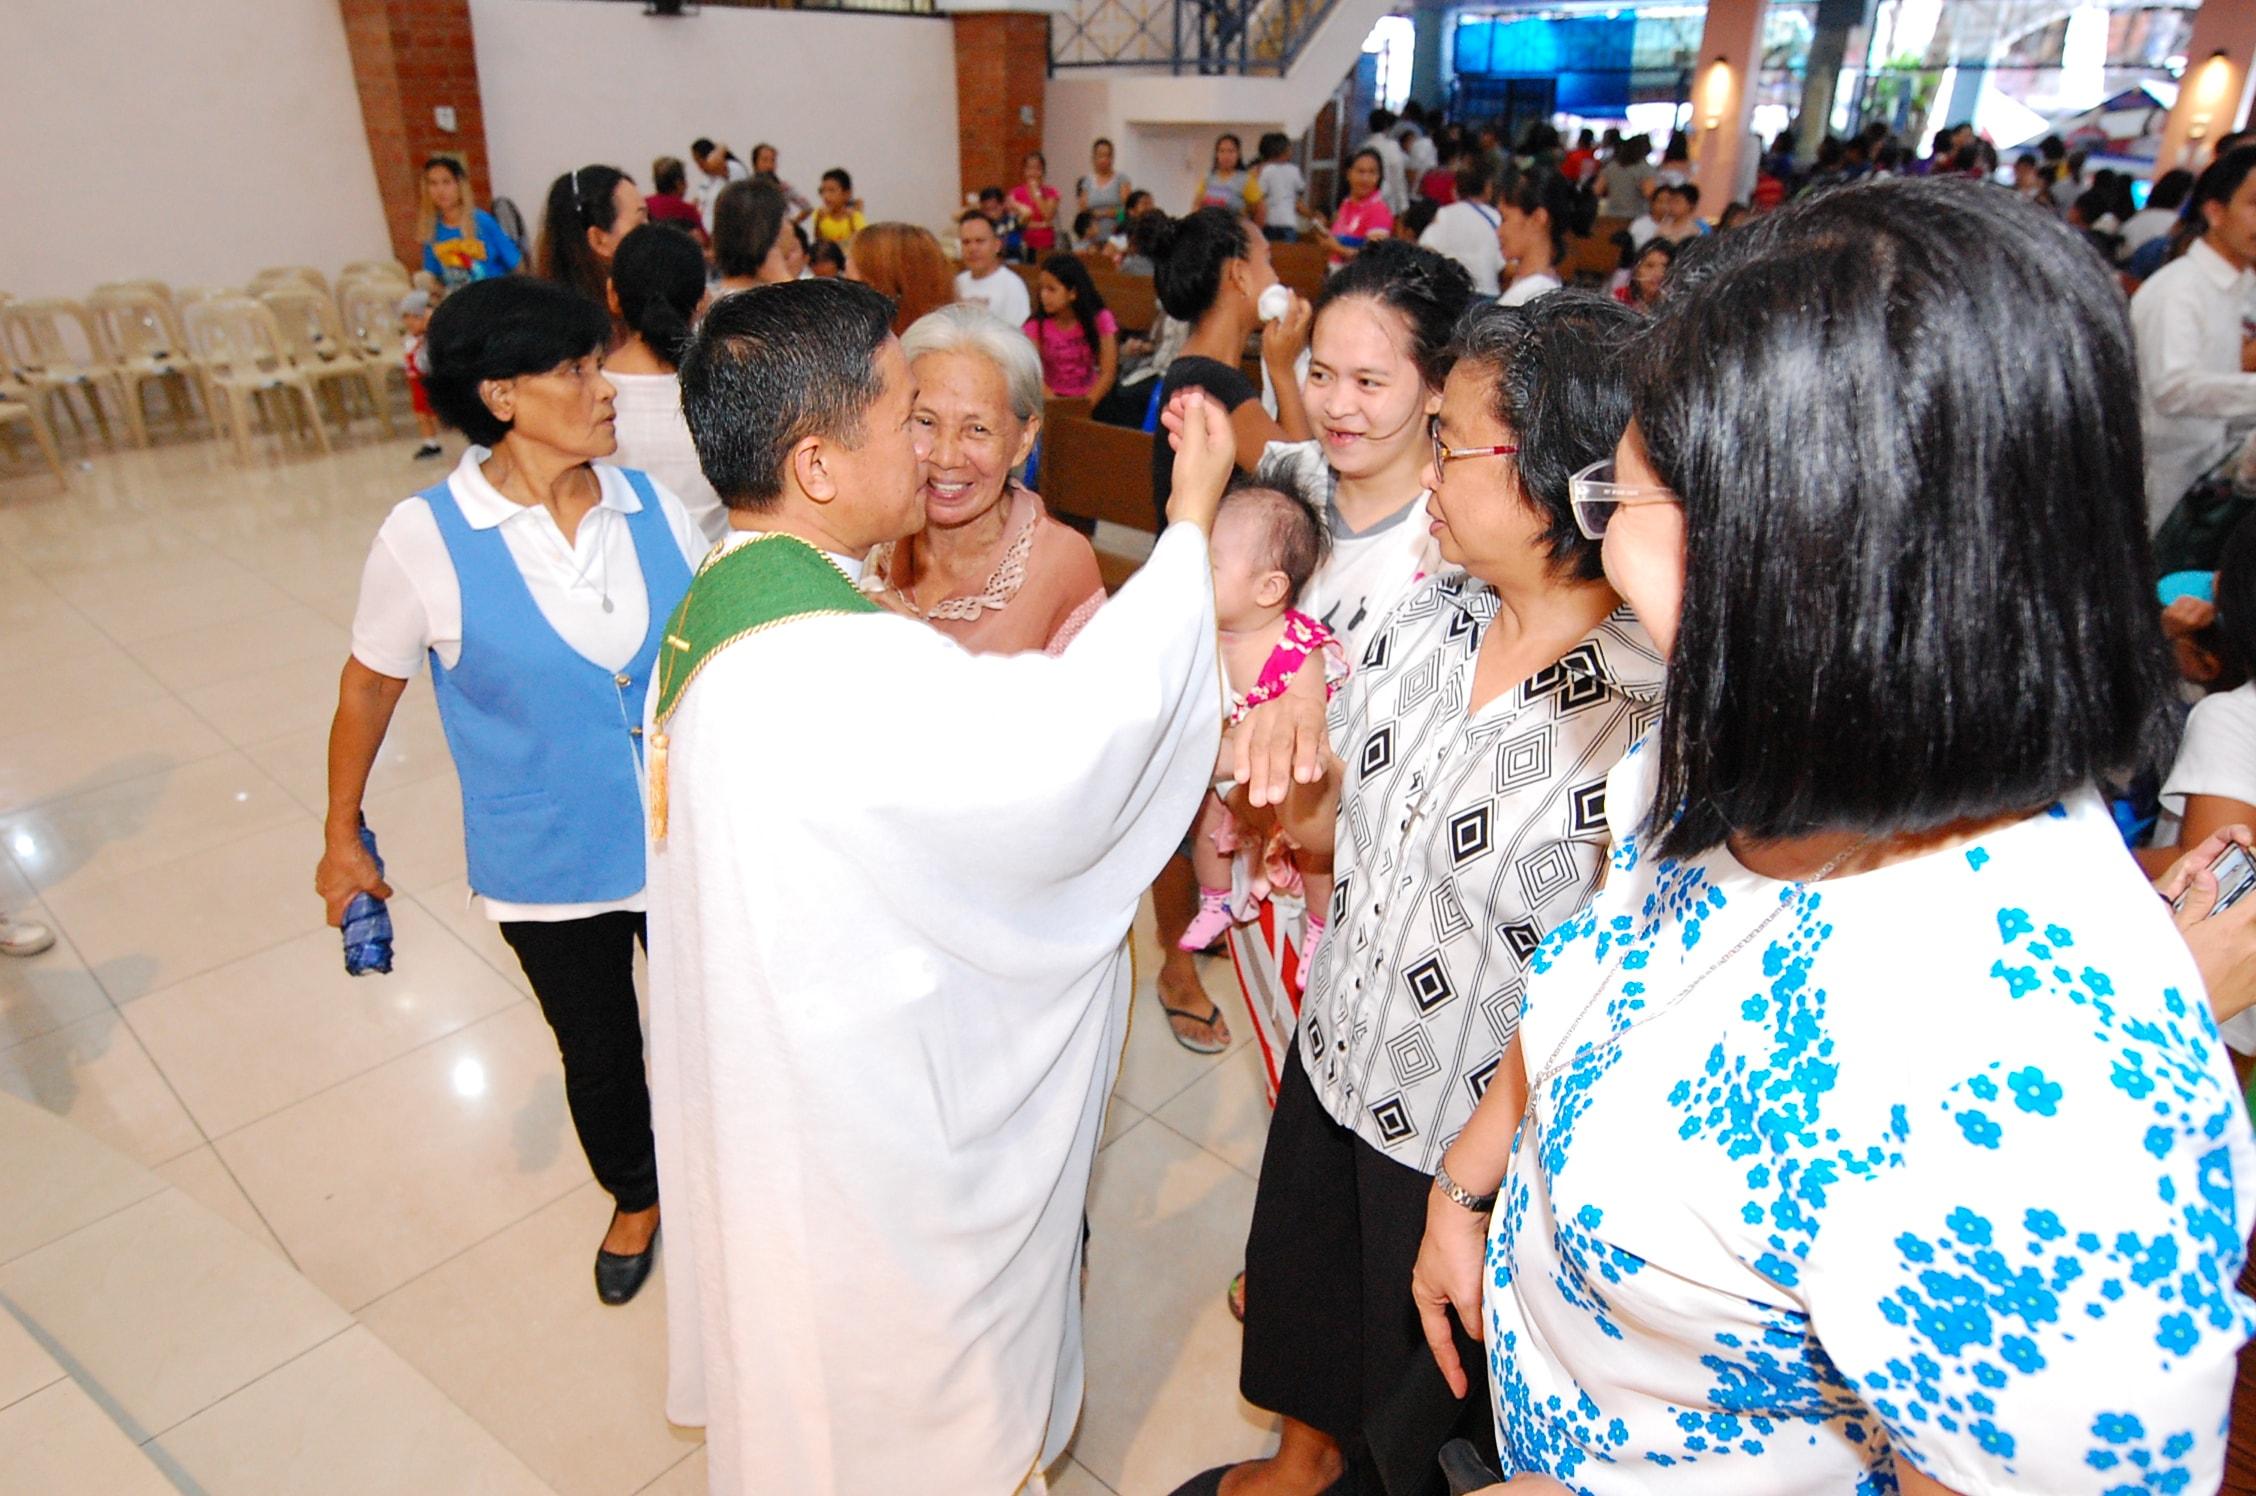 P. Michael Sandaga, CM, Parroco de Ina ng Lupang Pangako (Nuestra Señora de la Tierra Prometida)